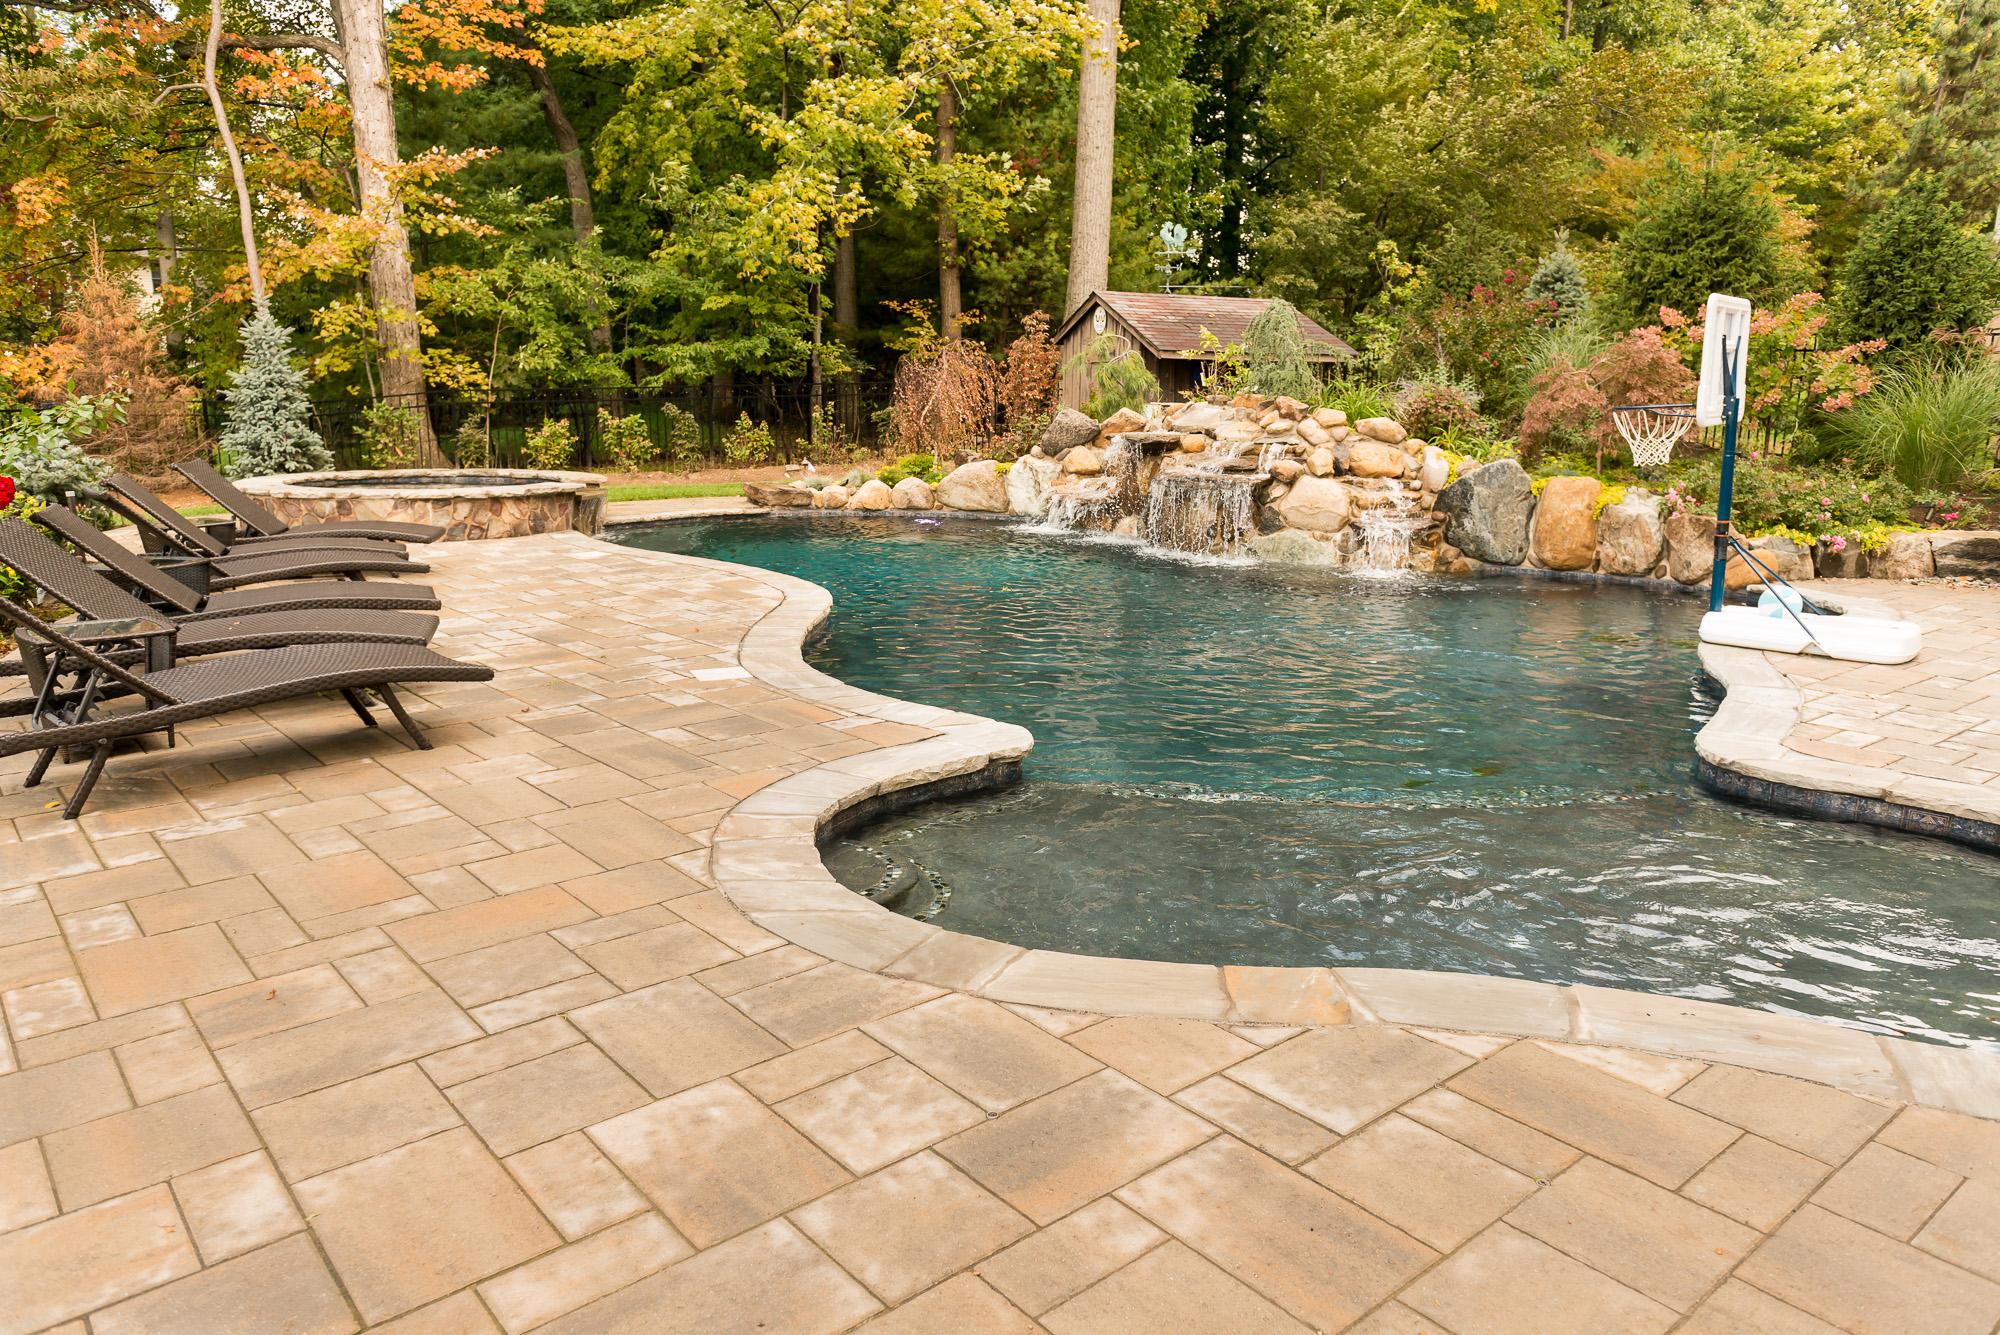 Rivervale nj custom inground swimming pool design for Outdoor pools in nj